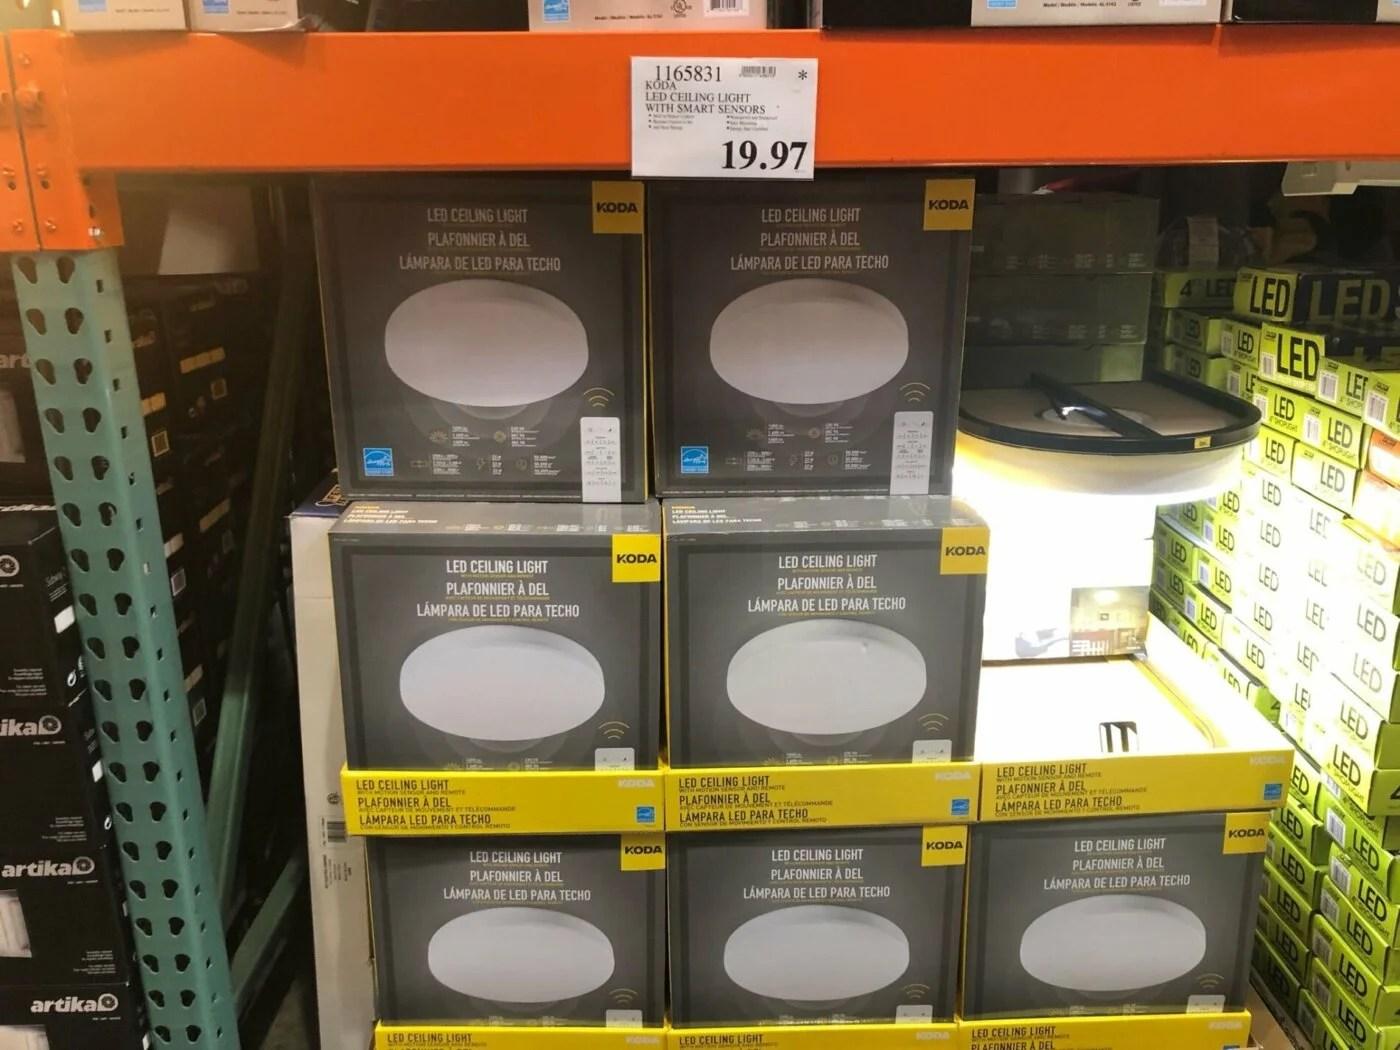 koda led ceiling light with smart